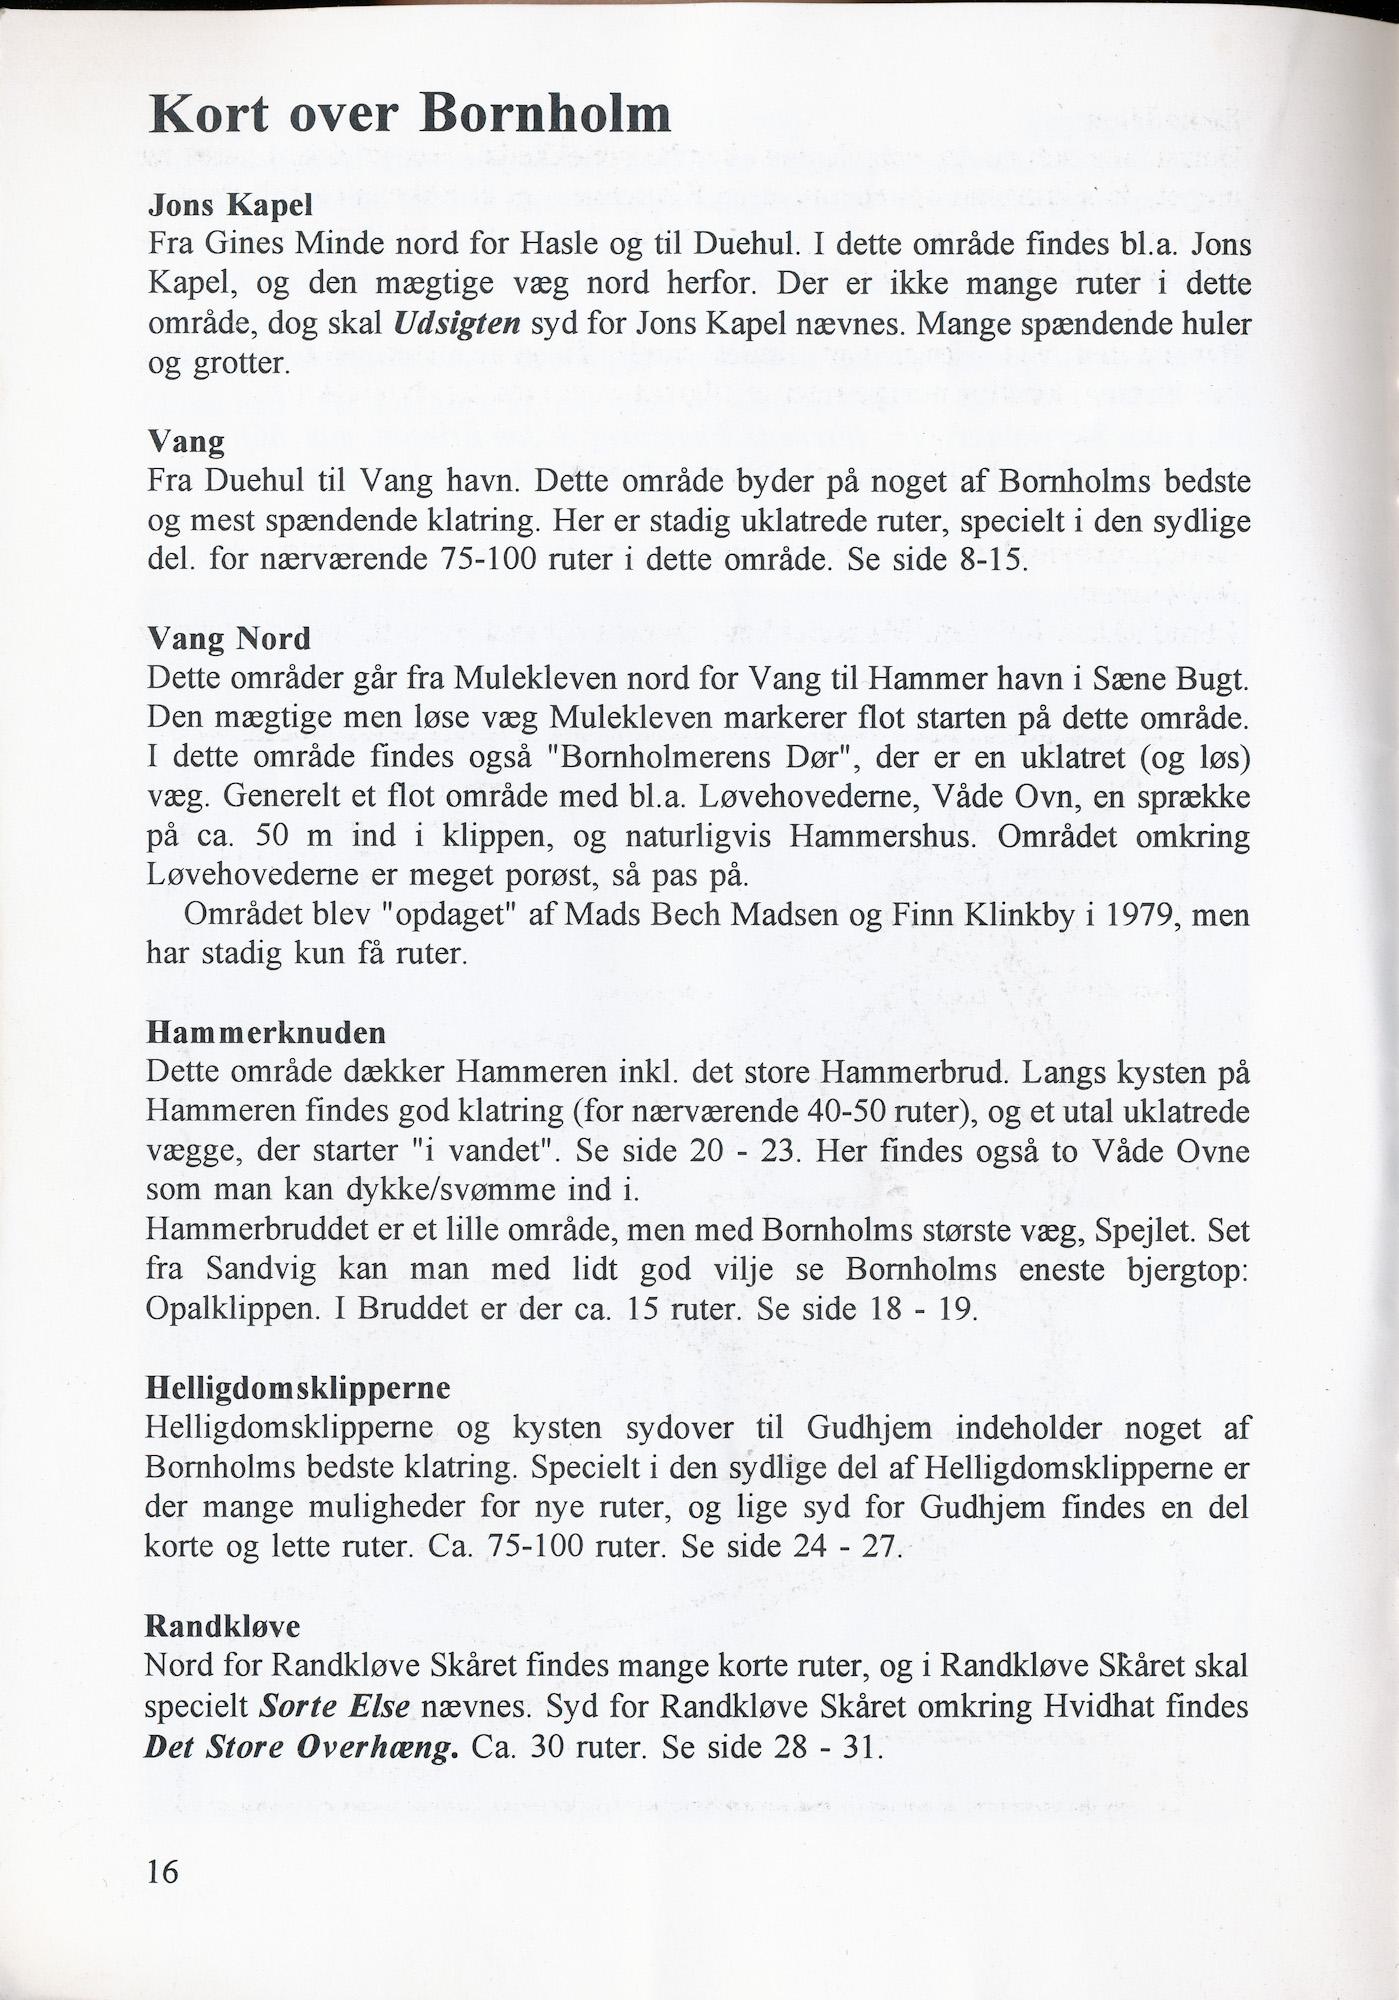 50 udvalgte ruter paa bornholm 1995 16.jpg